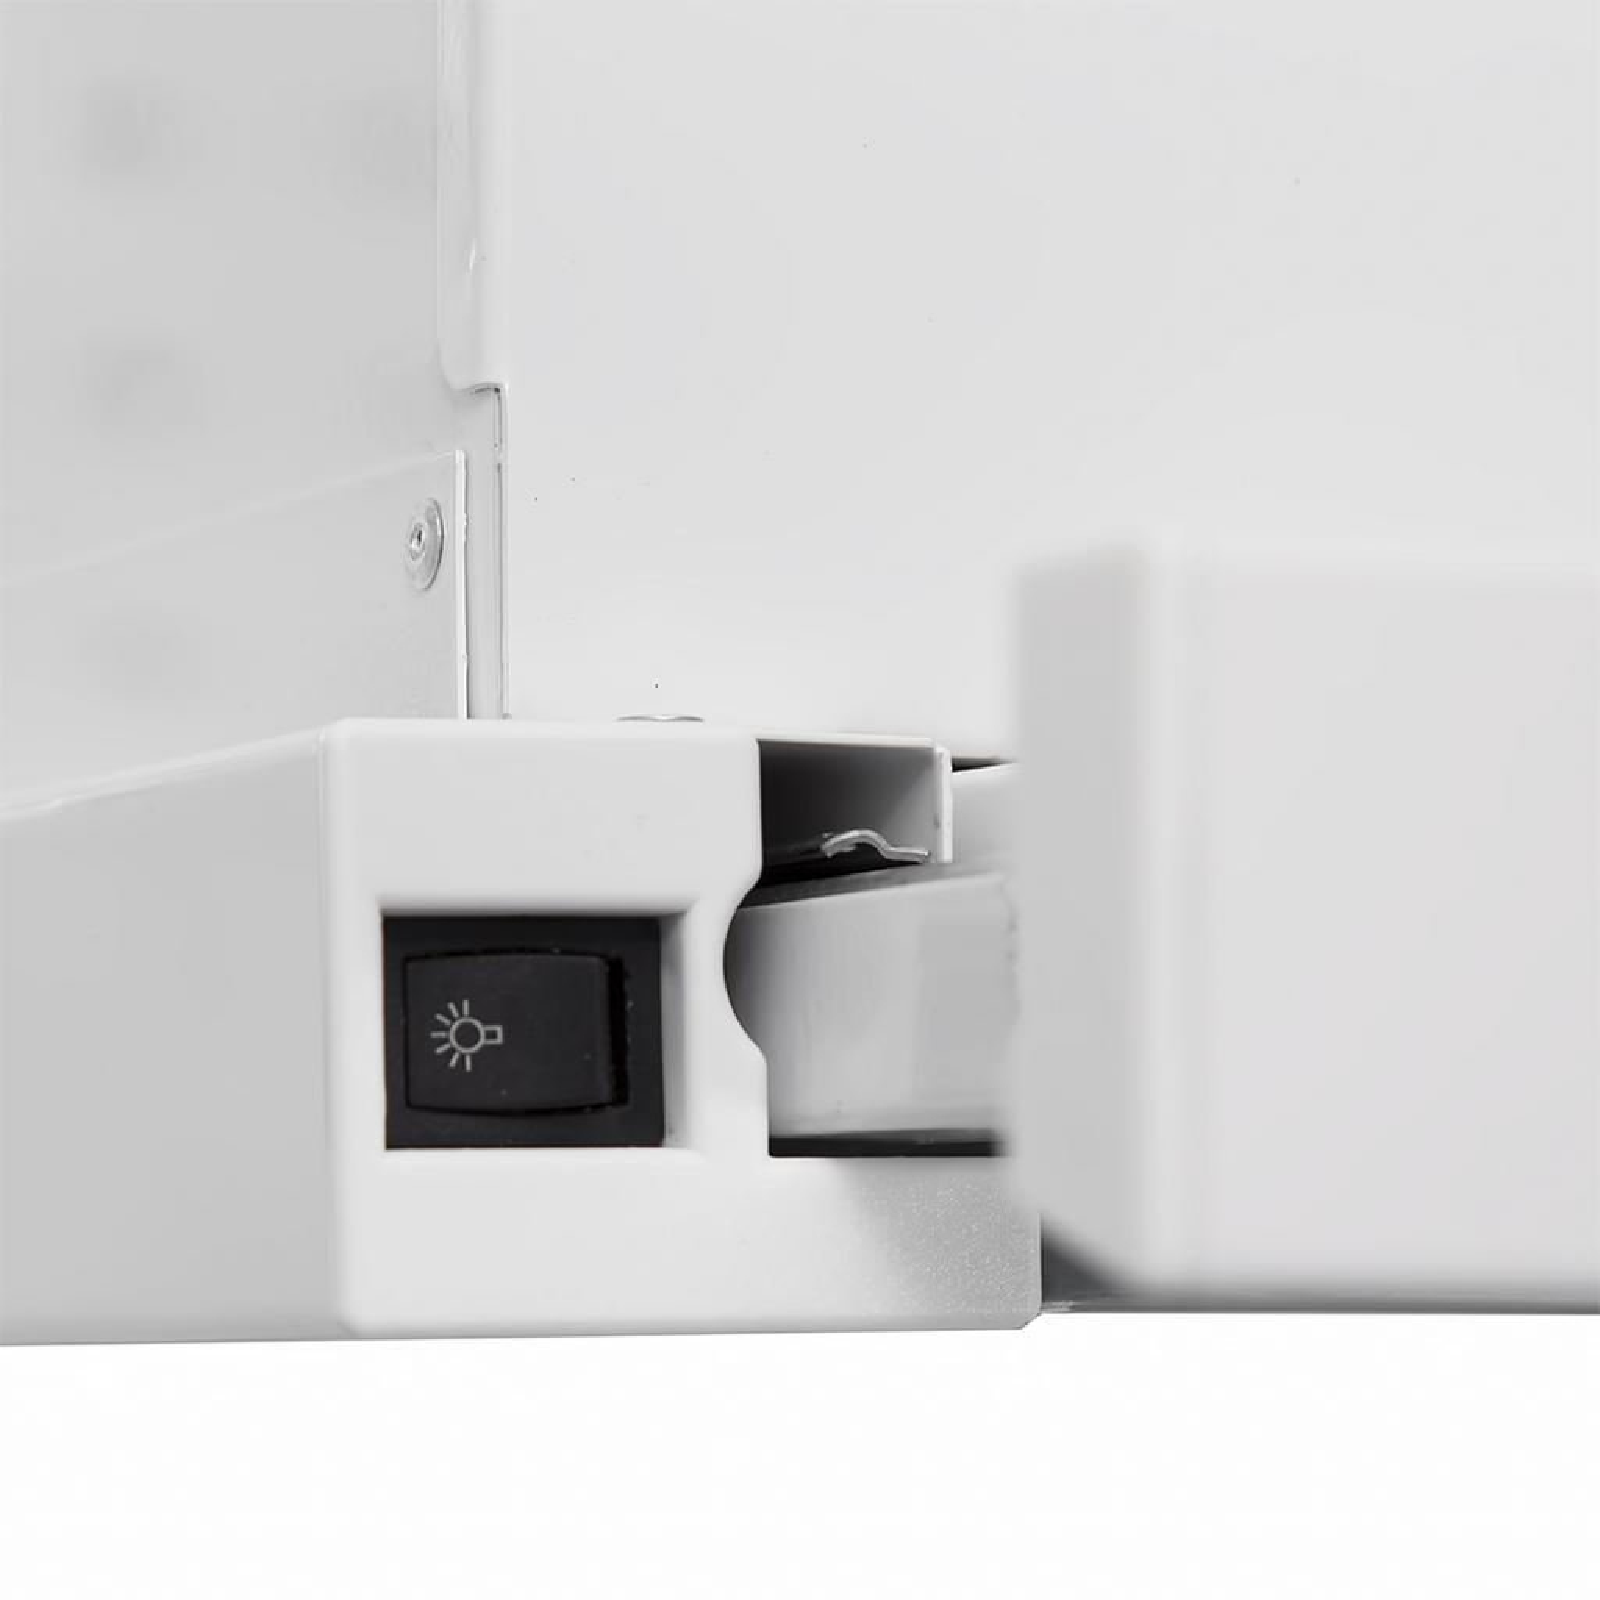 Вытяжка кухонная PERFELLI TL 6612 W LED изображение 4